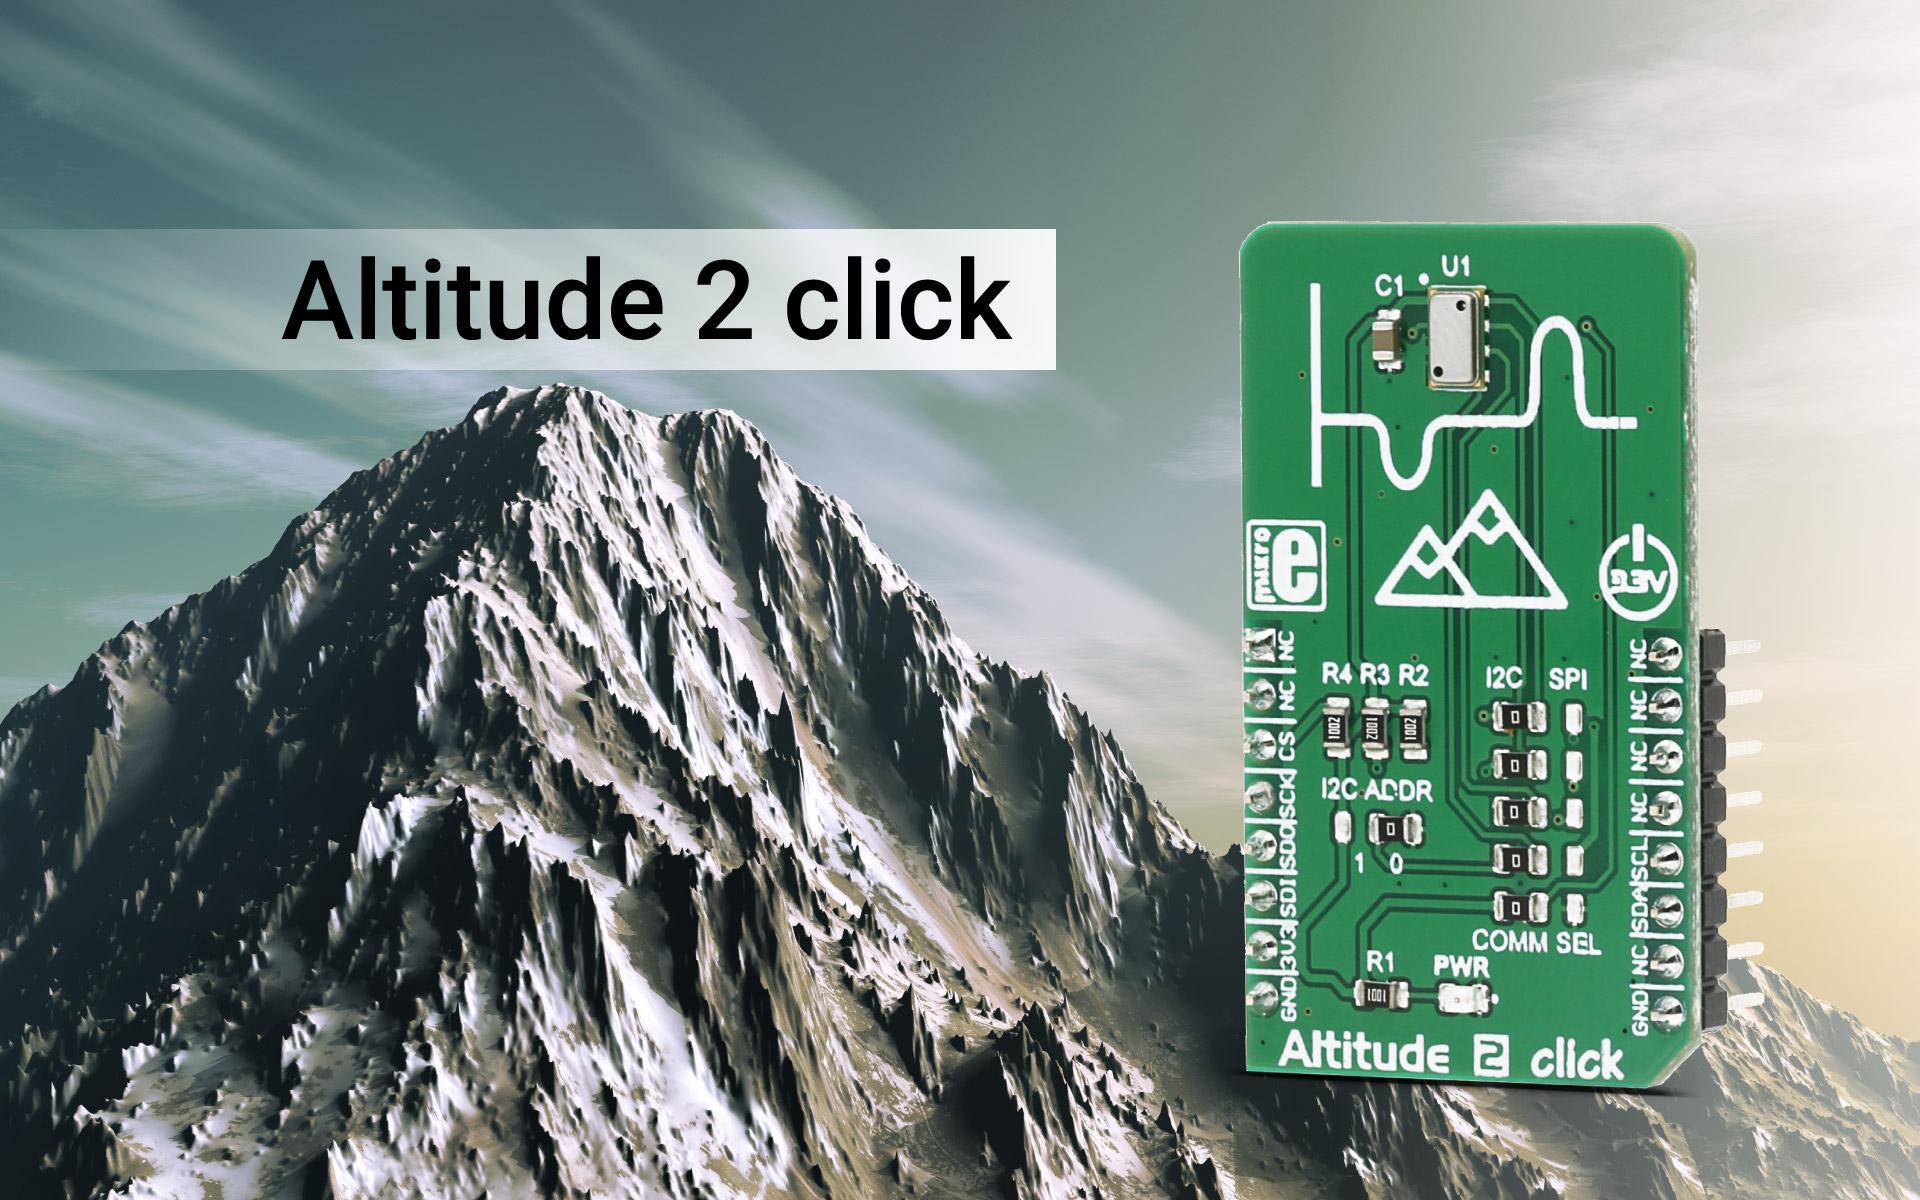 Barometric pressure sensor - Altitude 2 click